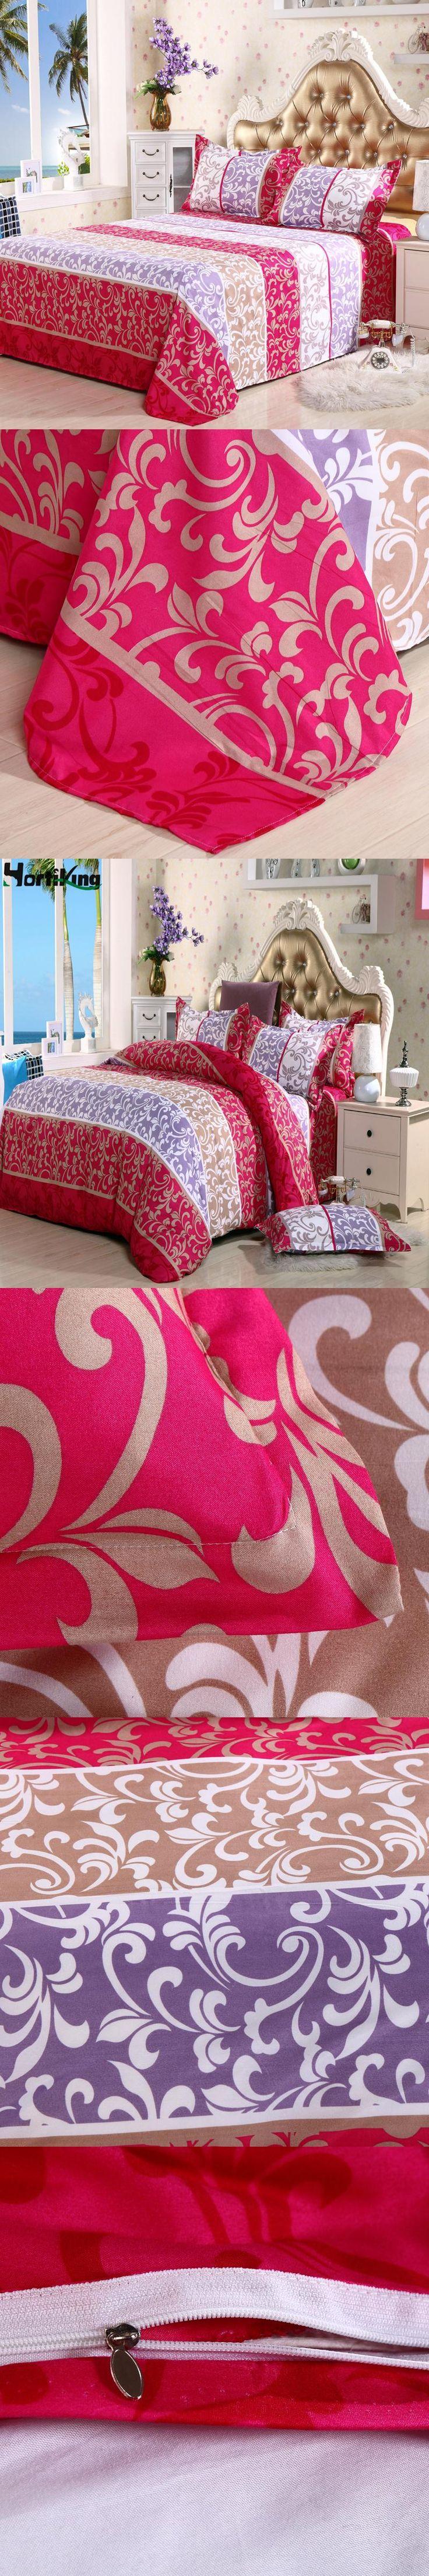 Home Textile 4 PCS/Lot cotton Bedding Sets Print Bed Set Duvet Cover Bed Sheet Pillowcase King/Queen/Full/Twin Size Bedding Set